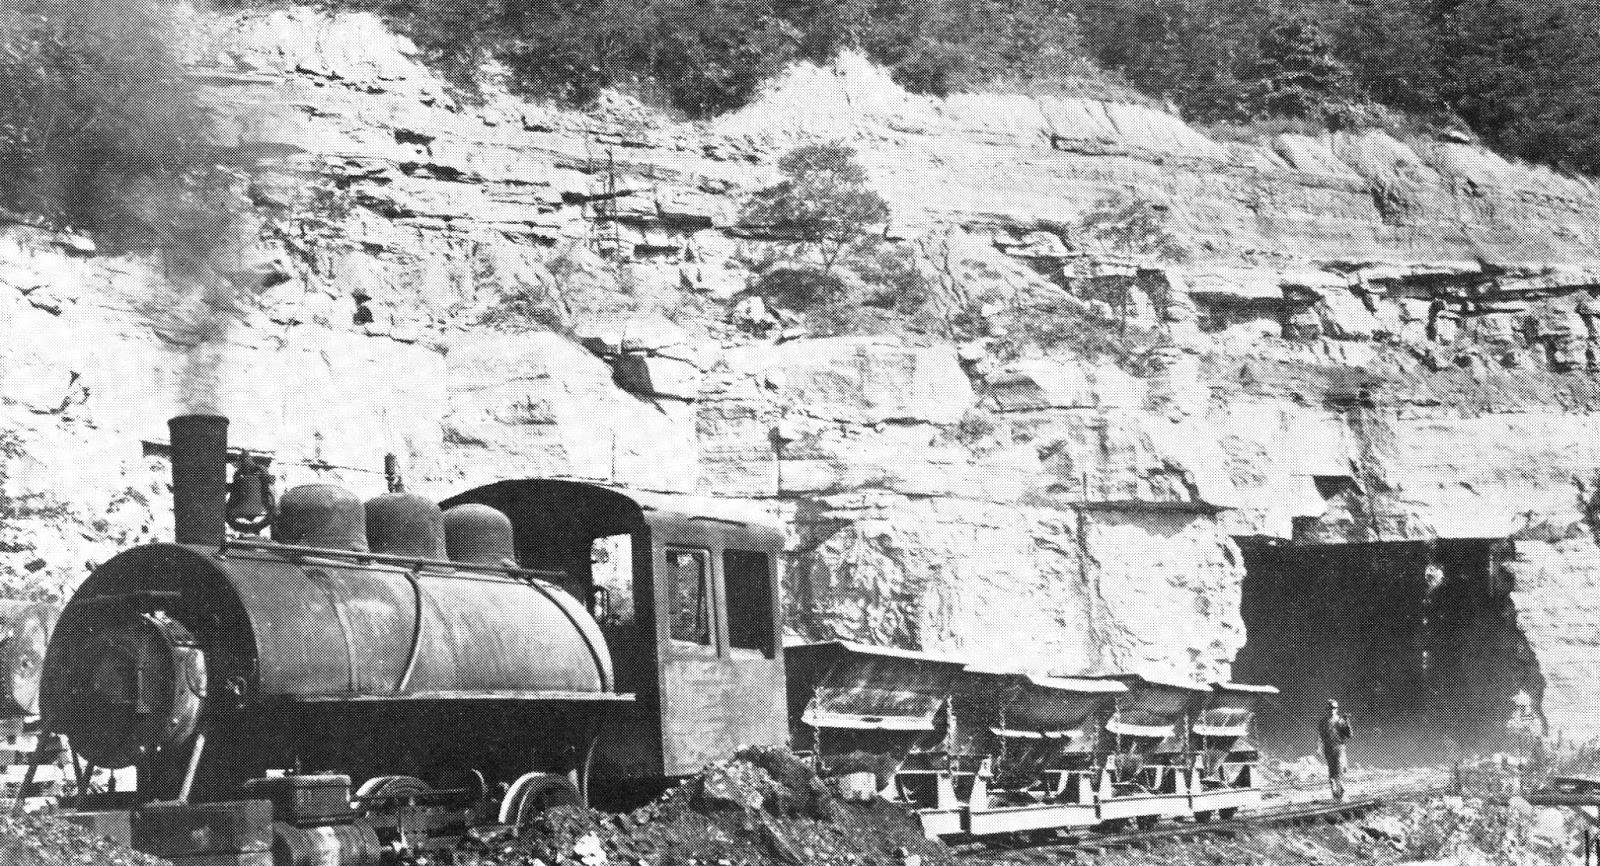 Model Railroad Minutiae: Limestone mining 1939